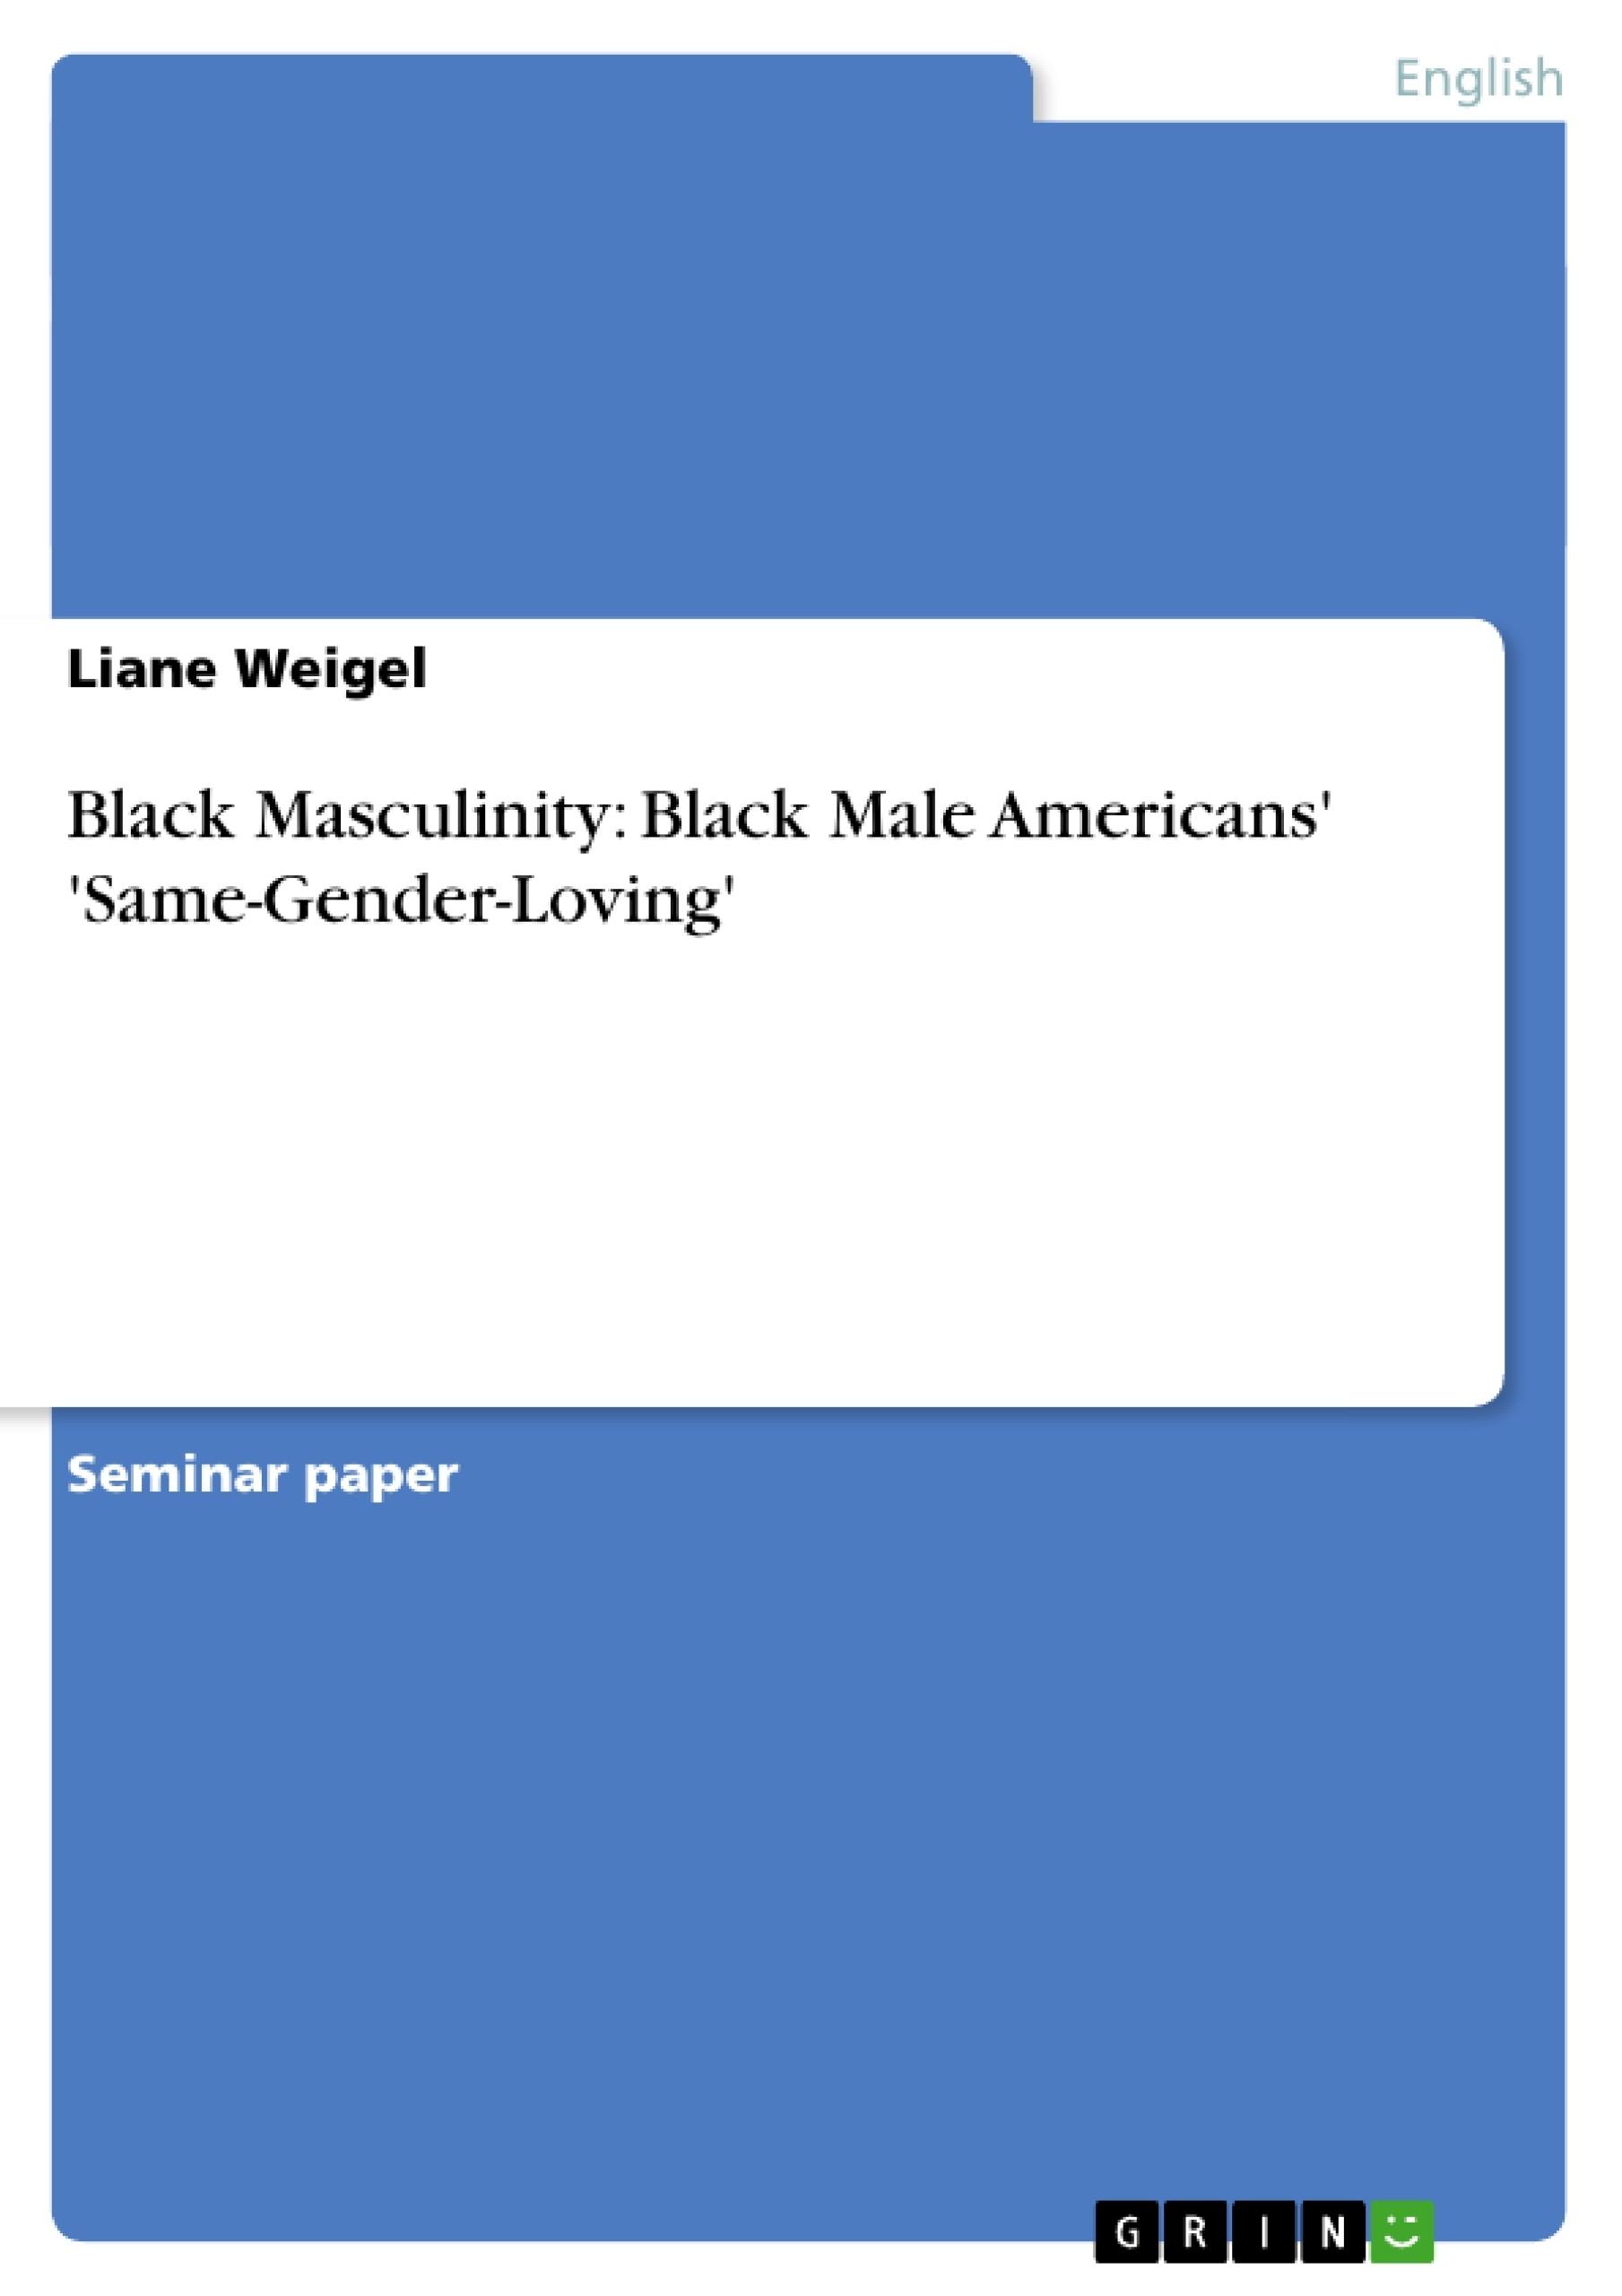 Title: Black Masculinity: Black Male Americans' 'Same-Gender-Loving'